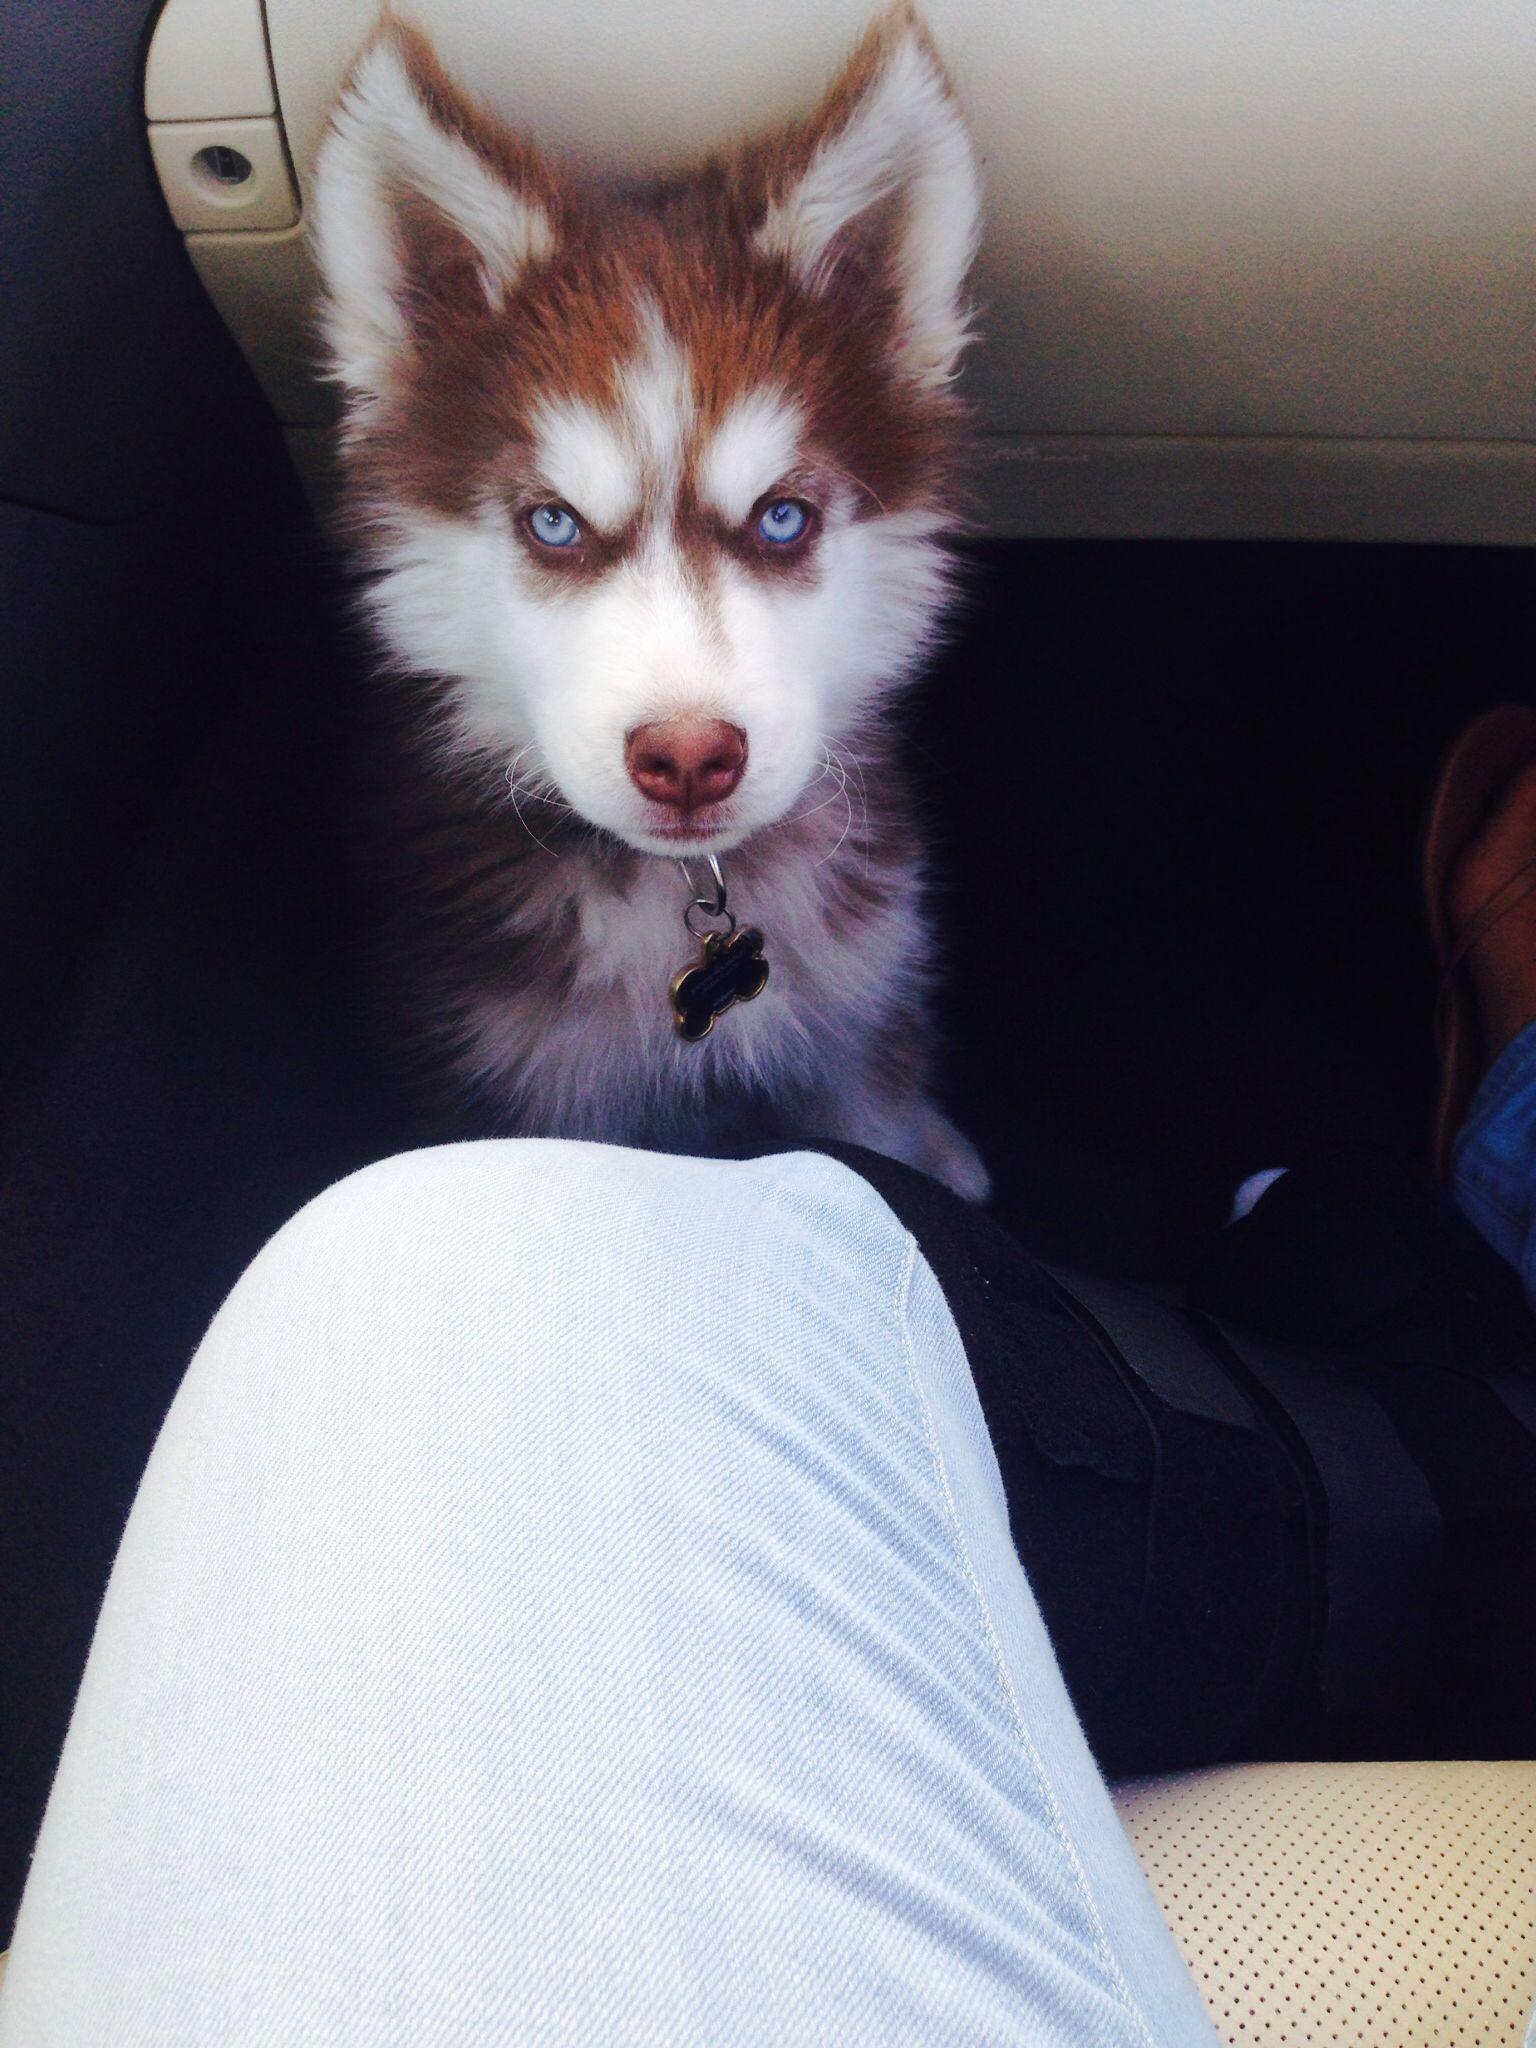 Husky puppy I want a Husky puppy & Dalmation puppy